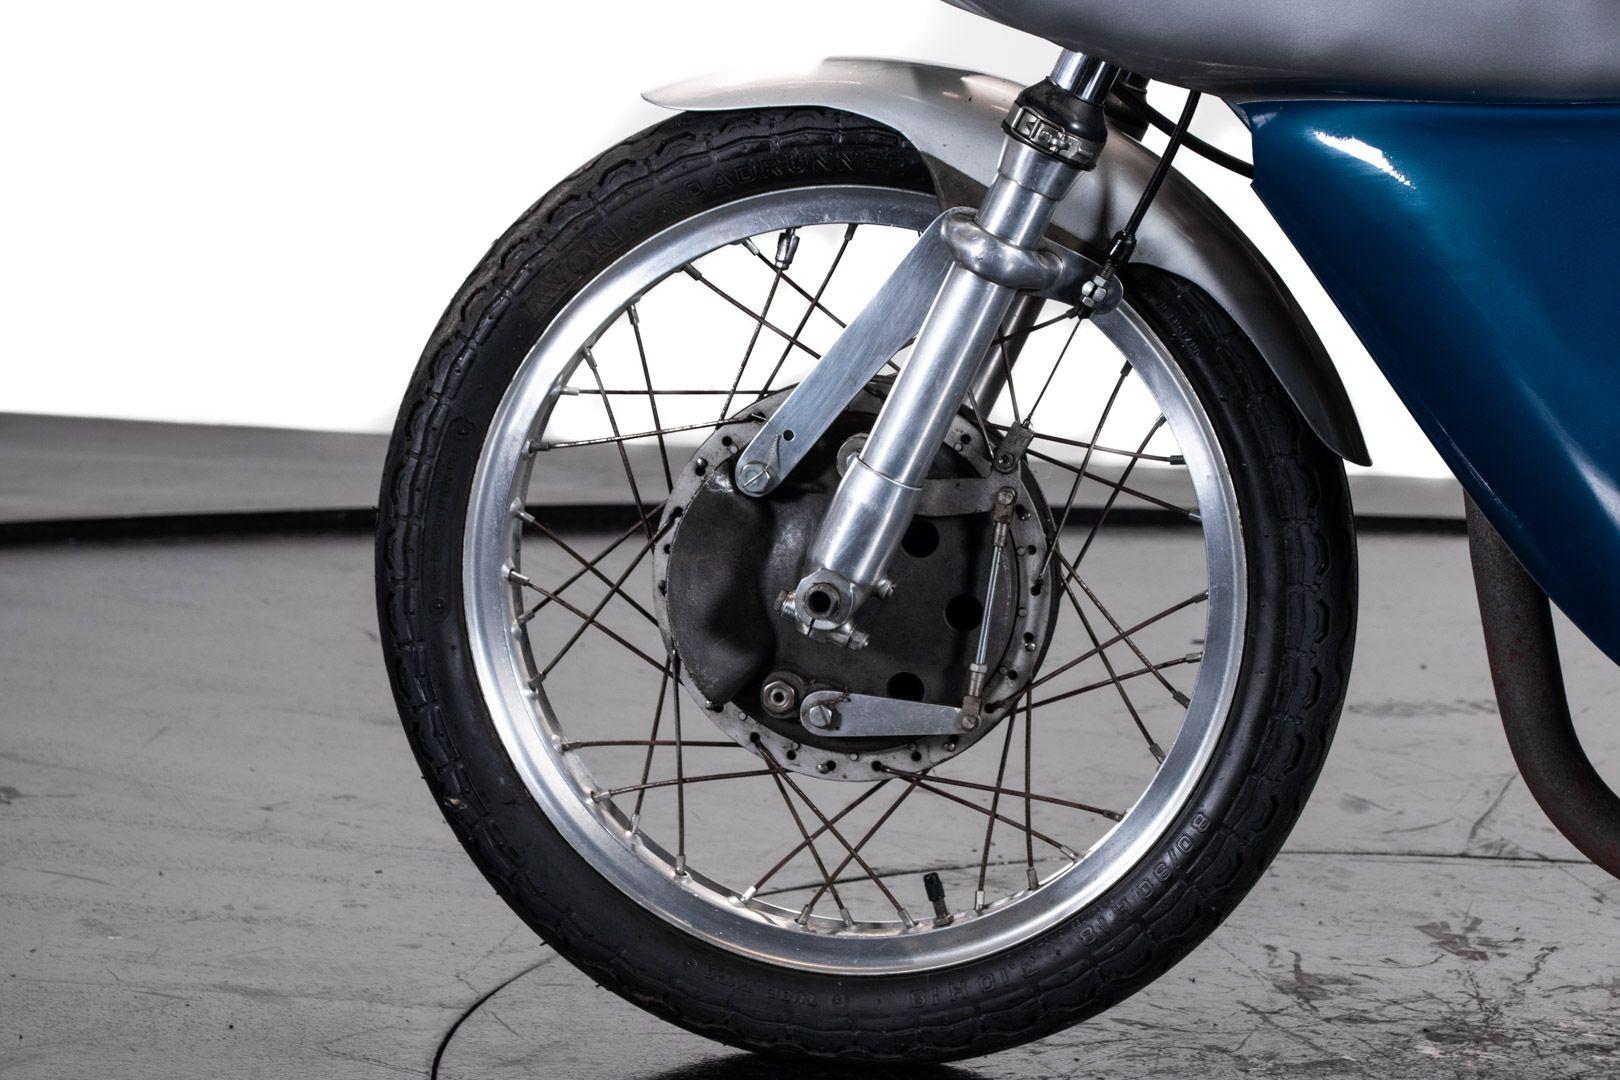 1960 Ducati Mach 1 Corsa NCR 82194